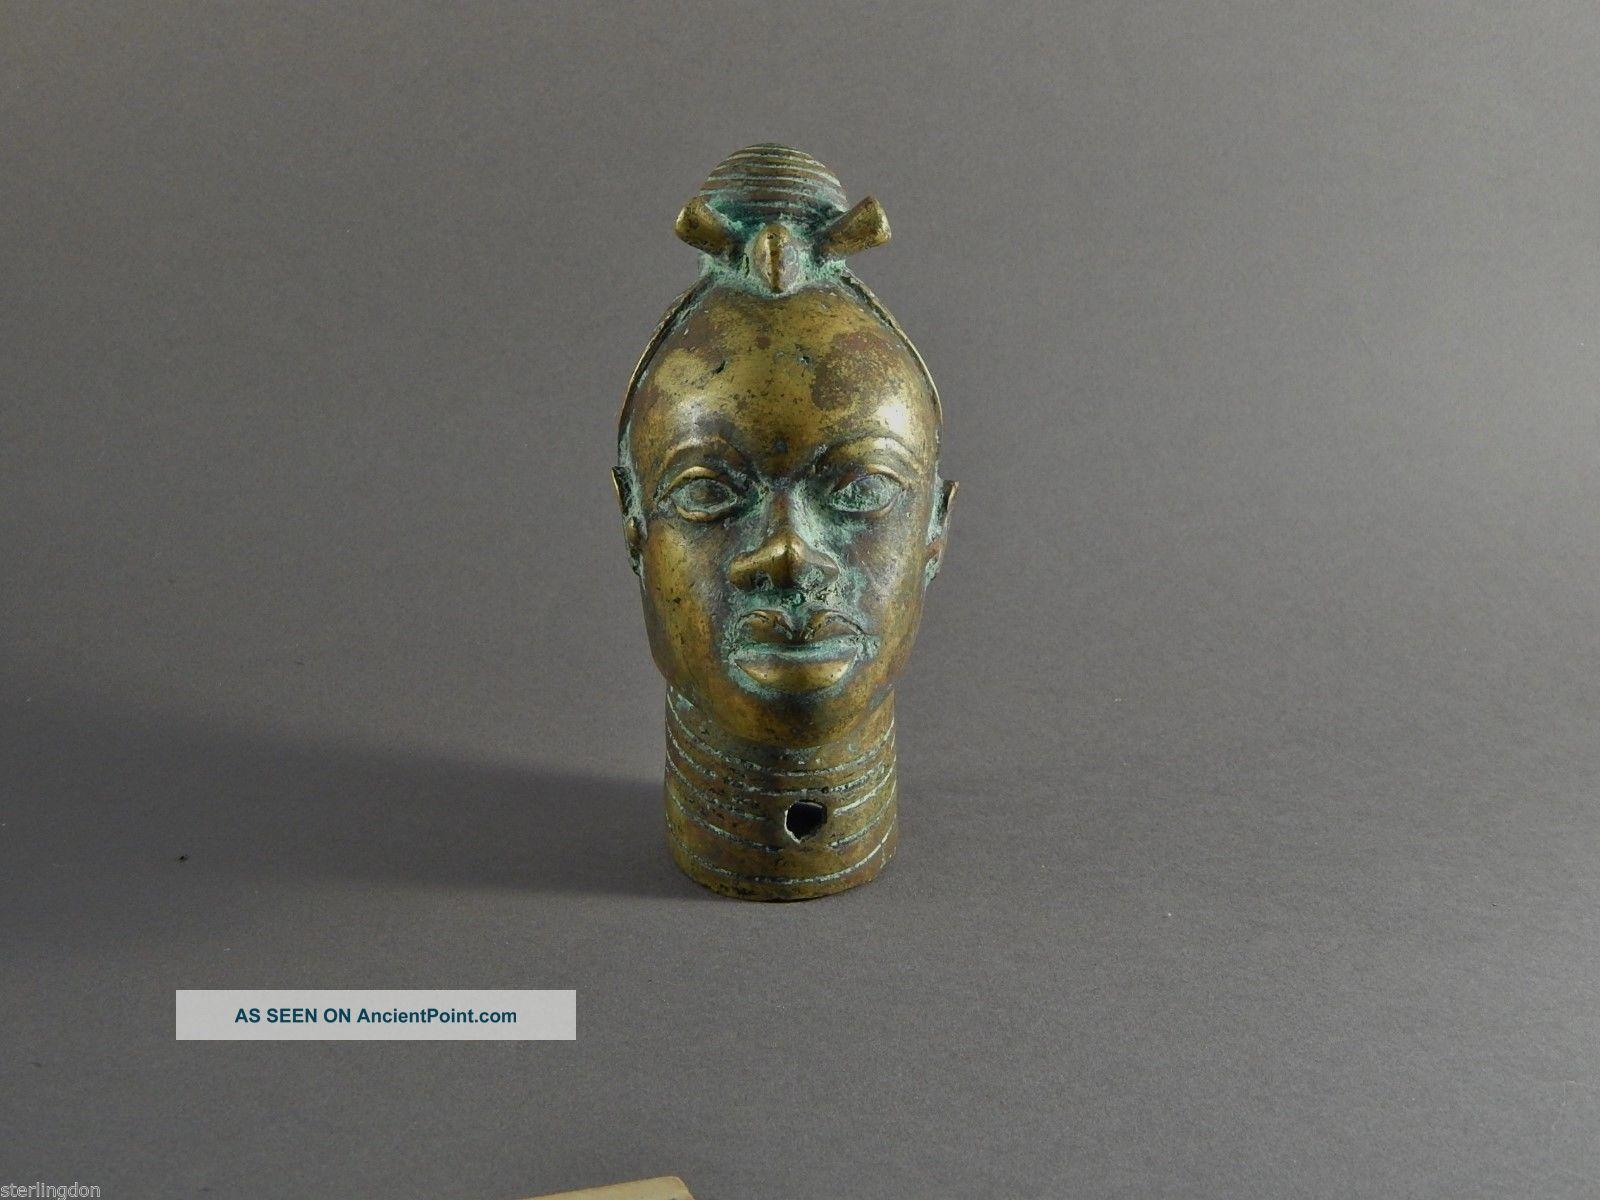 Extraordinary Brass Or Bronze Metal Benin Head Ex Salander - O ' Reilly Galleries Sculptures & Statues photo